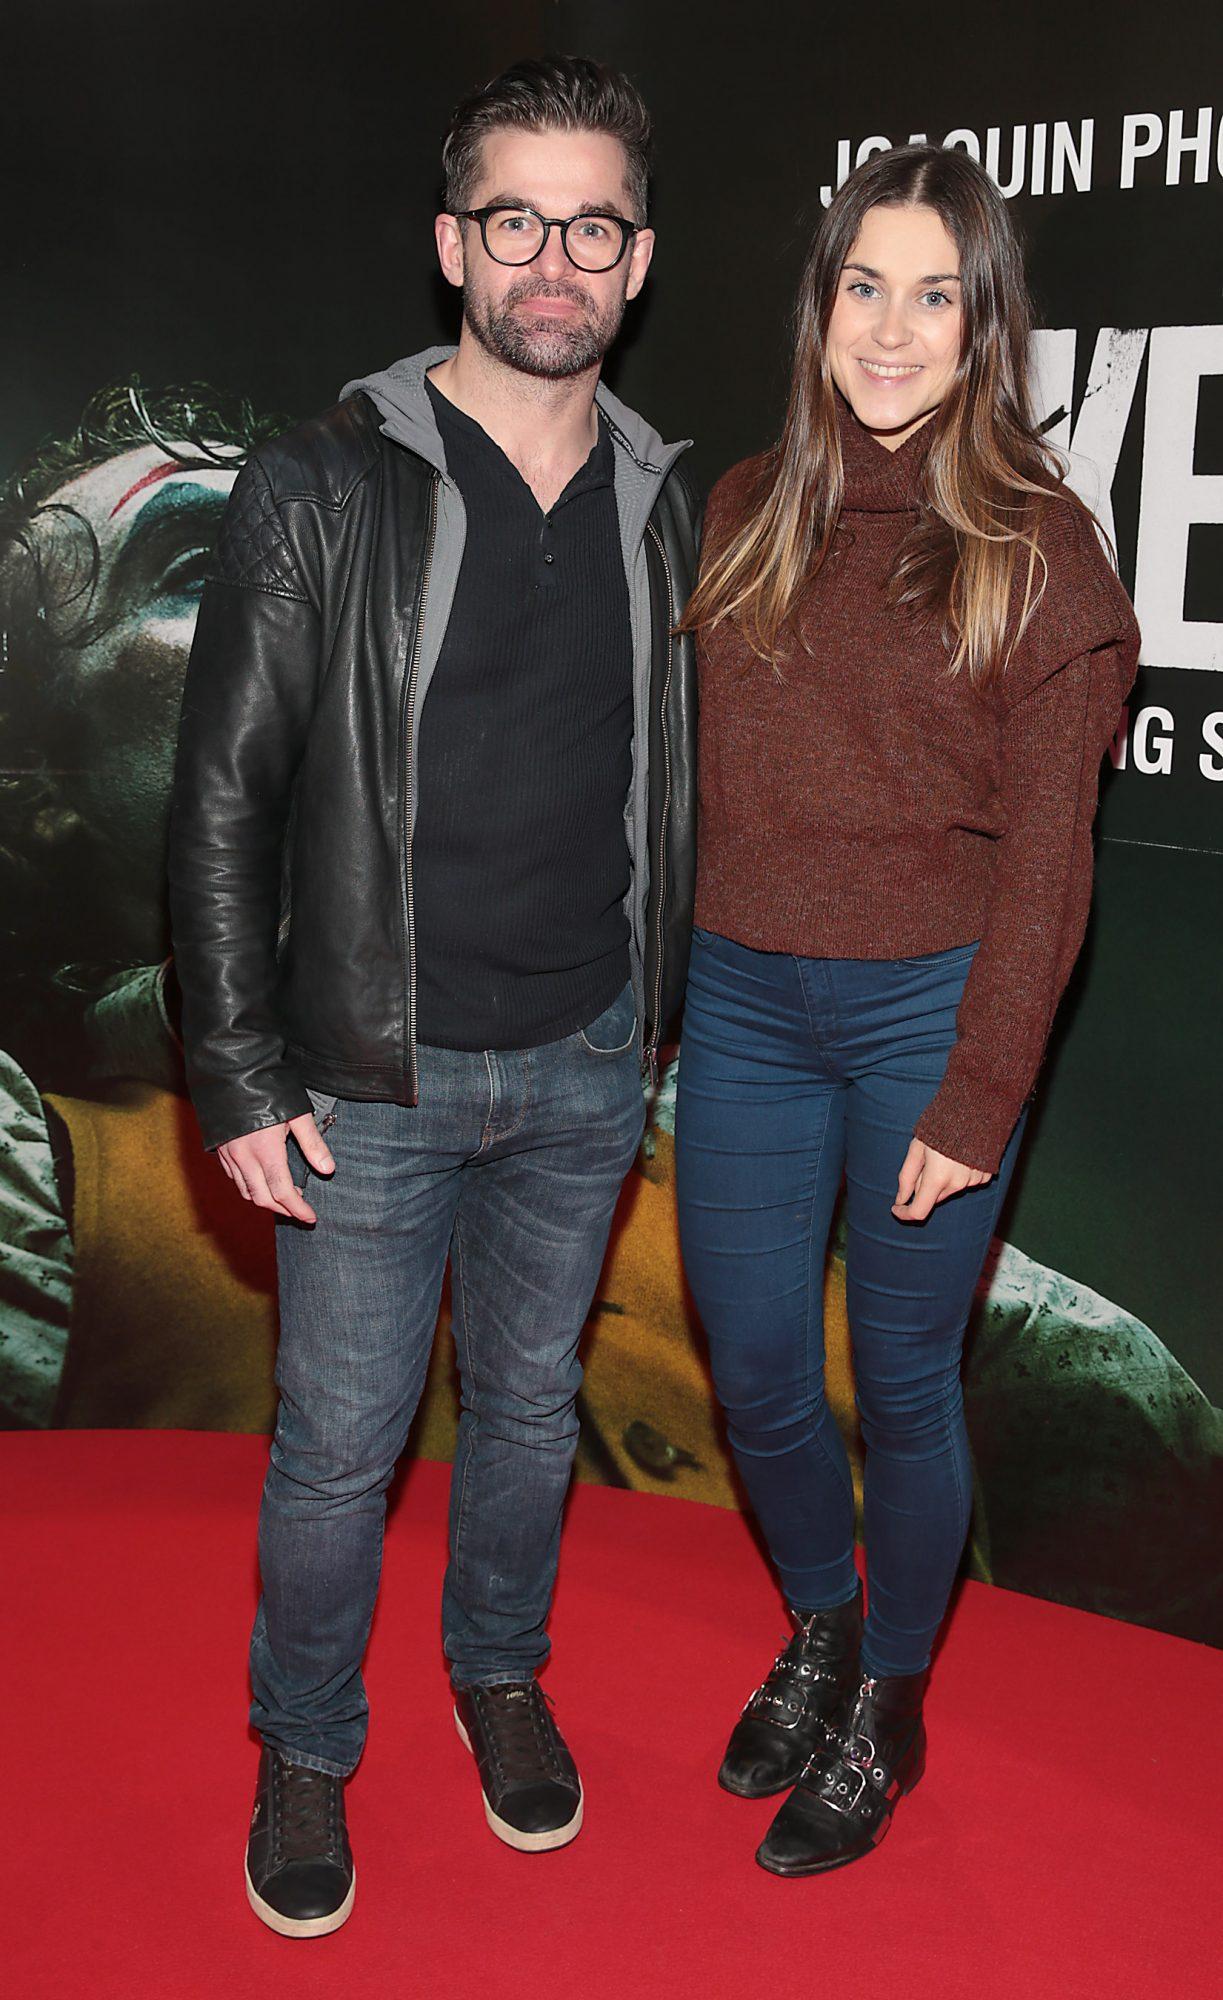 Mike Sheridan and Jo Linehan at the Irish Premiere screening of Joker at Cineworld, Dublin. Pic: Brian McEvoy.